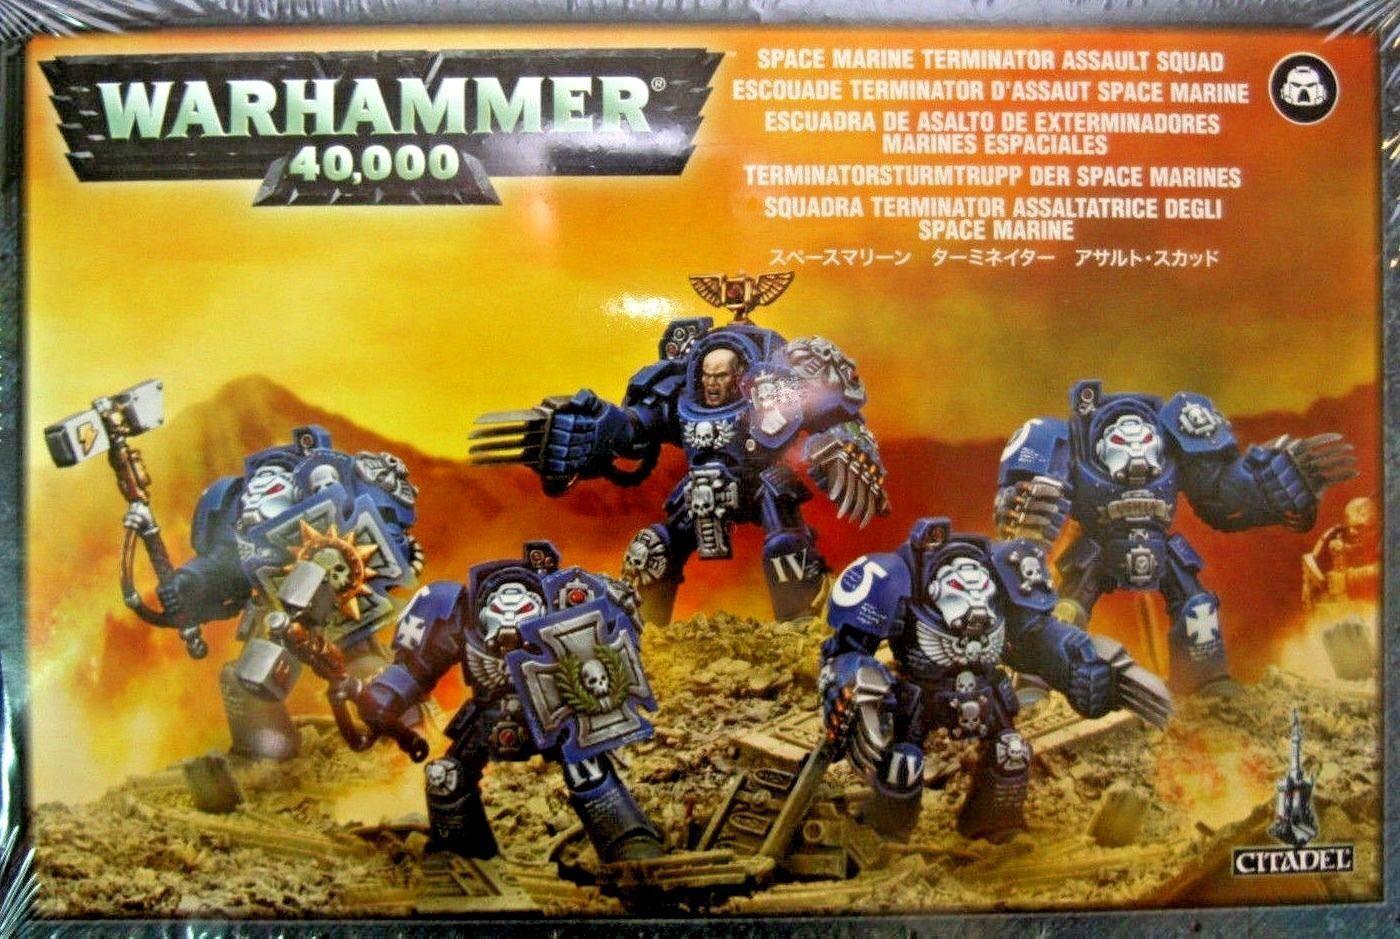 Space Marines TERMINATOR CLOSE COMBAT ASSAULT Squad Games Workshop Warhammer 40K